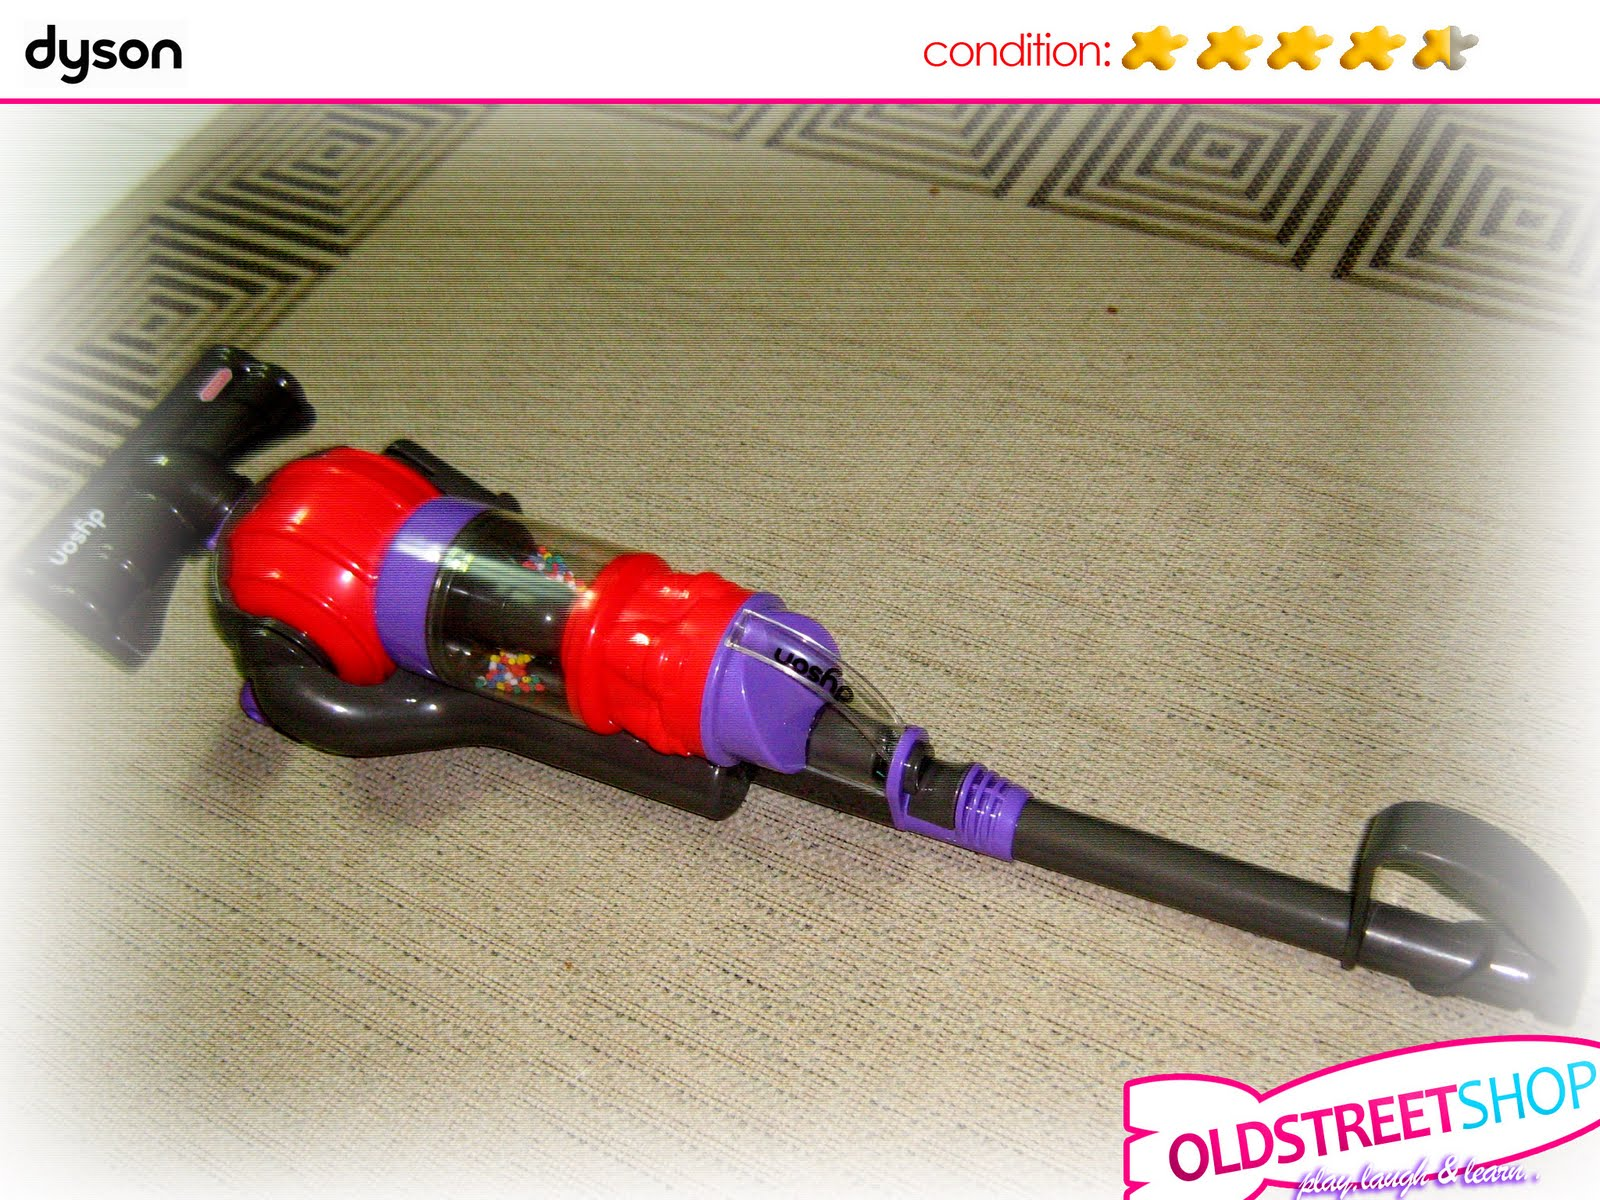 Oldstreetshop Dyson Upright Vacuum Cleaner